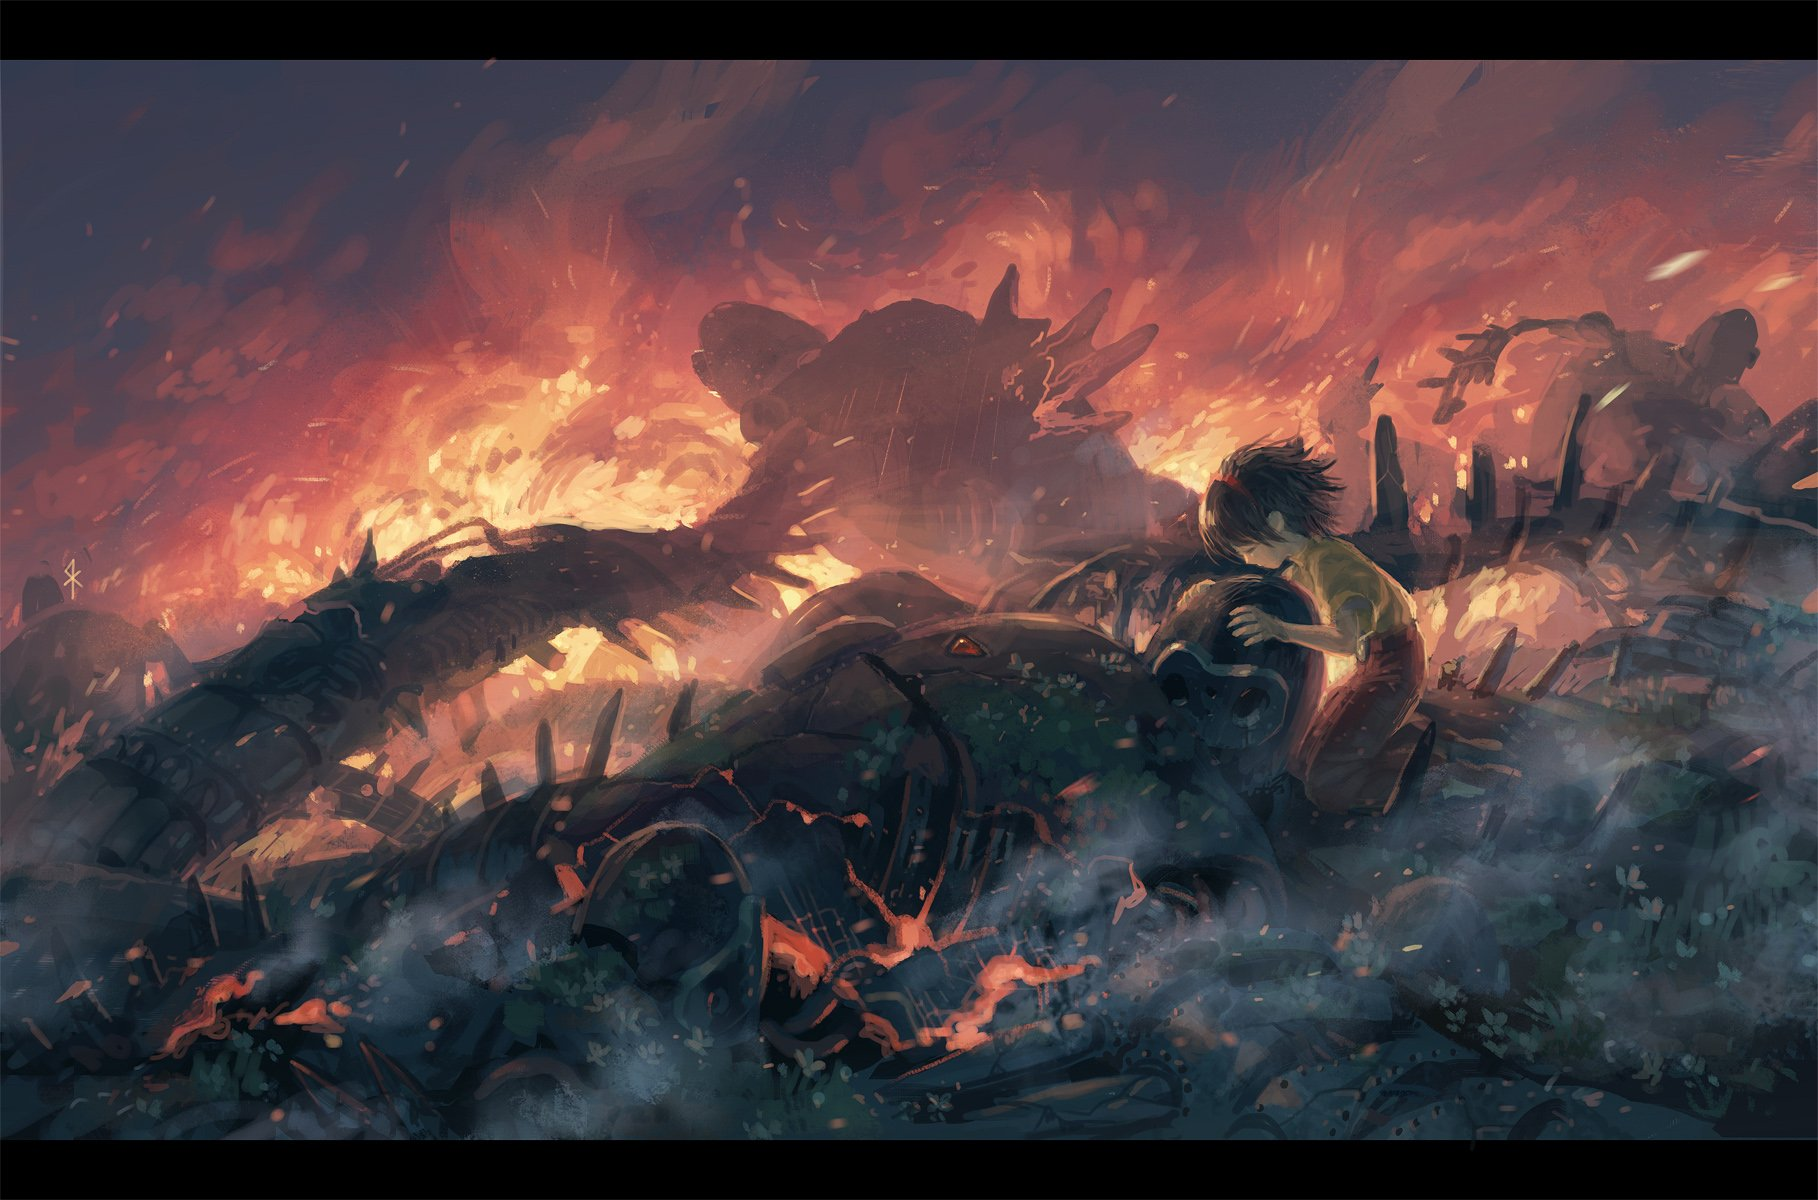 Tenkuu no shiro laputa wallpaper and background image - Anime war wallpaper ...